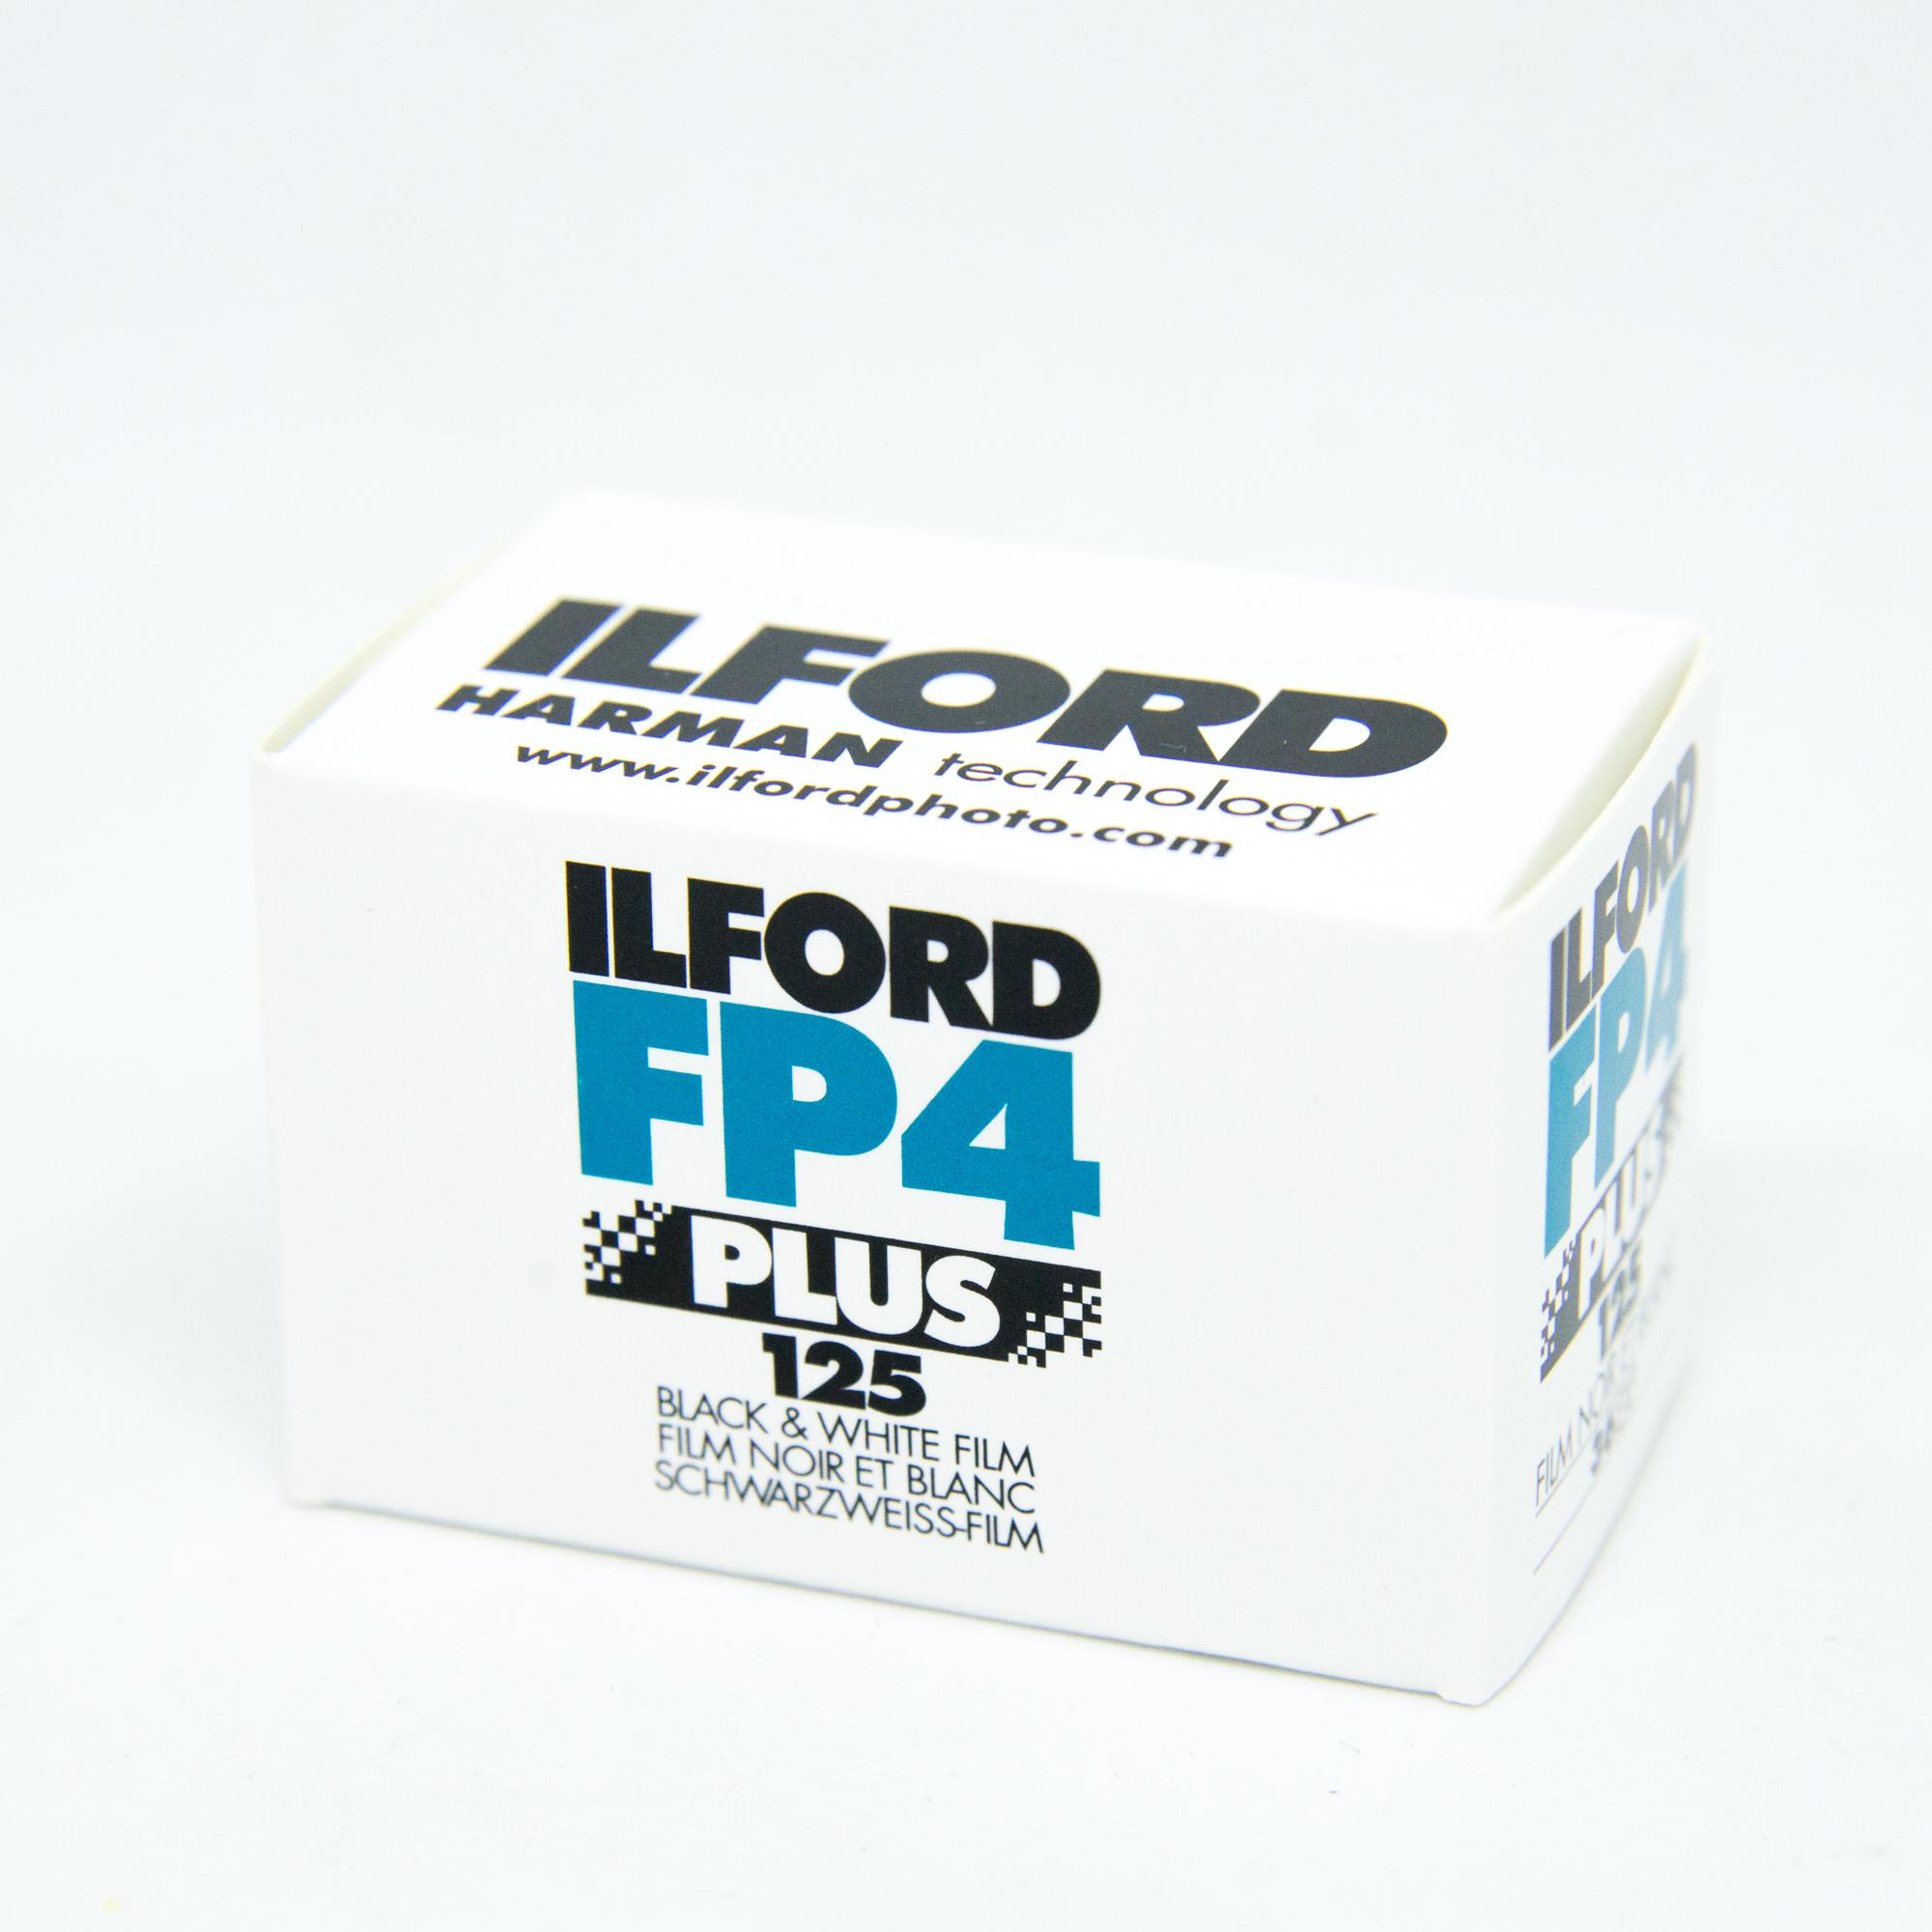 Фотопленка Ilford FP4 Plus 125/135-36